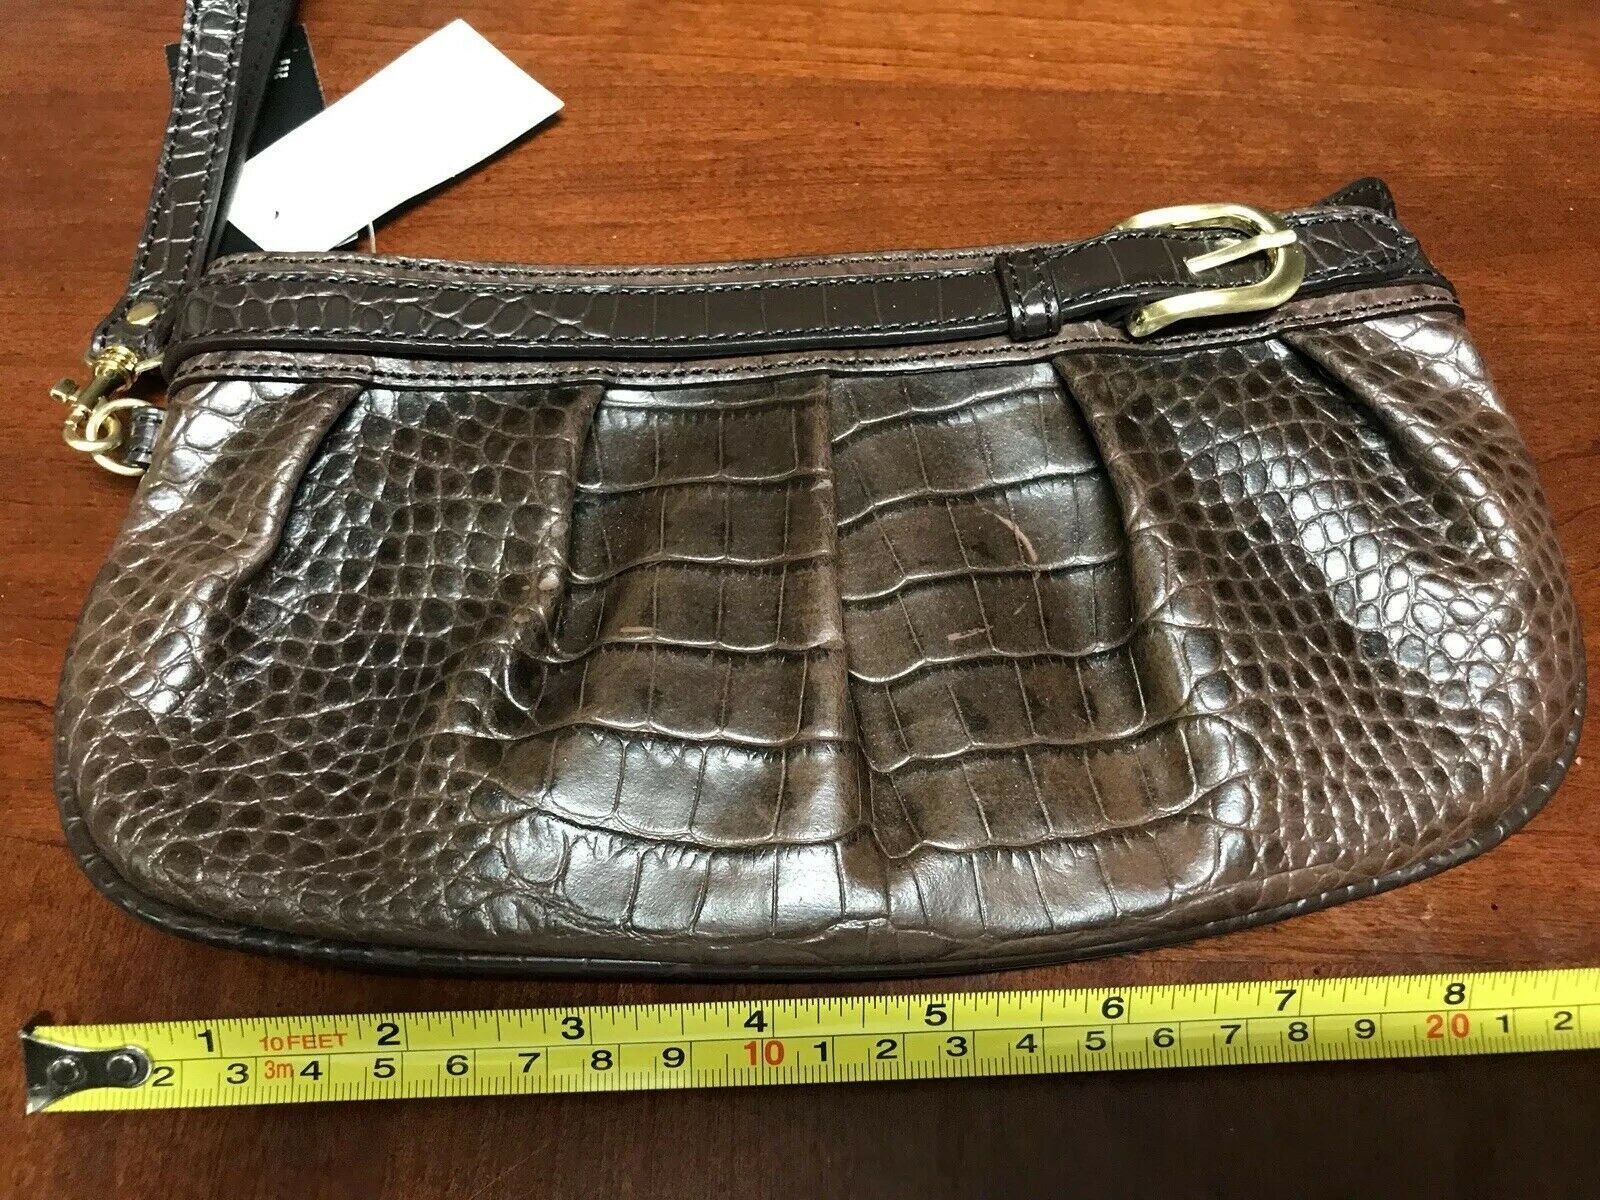 NEW Genuine Leather Joy Mangano Purse Tote w// RFID Clutch Handbag Pocketbook